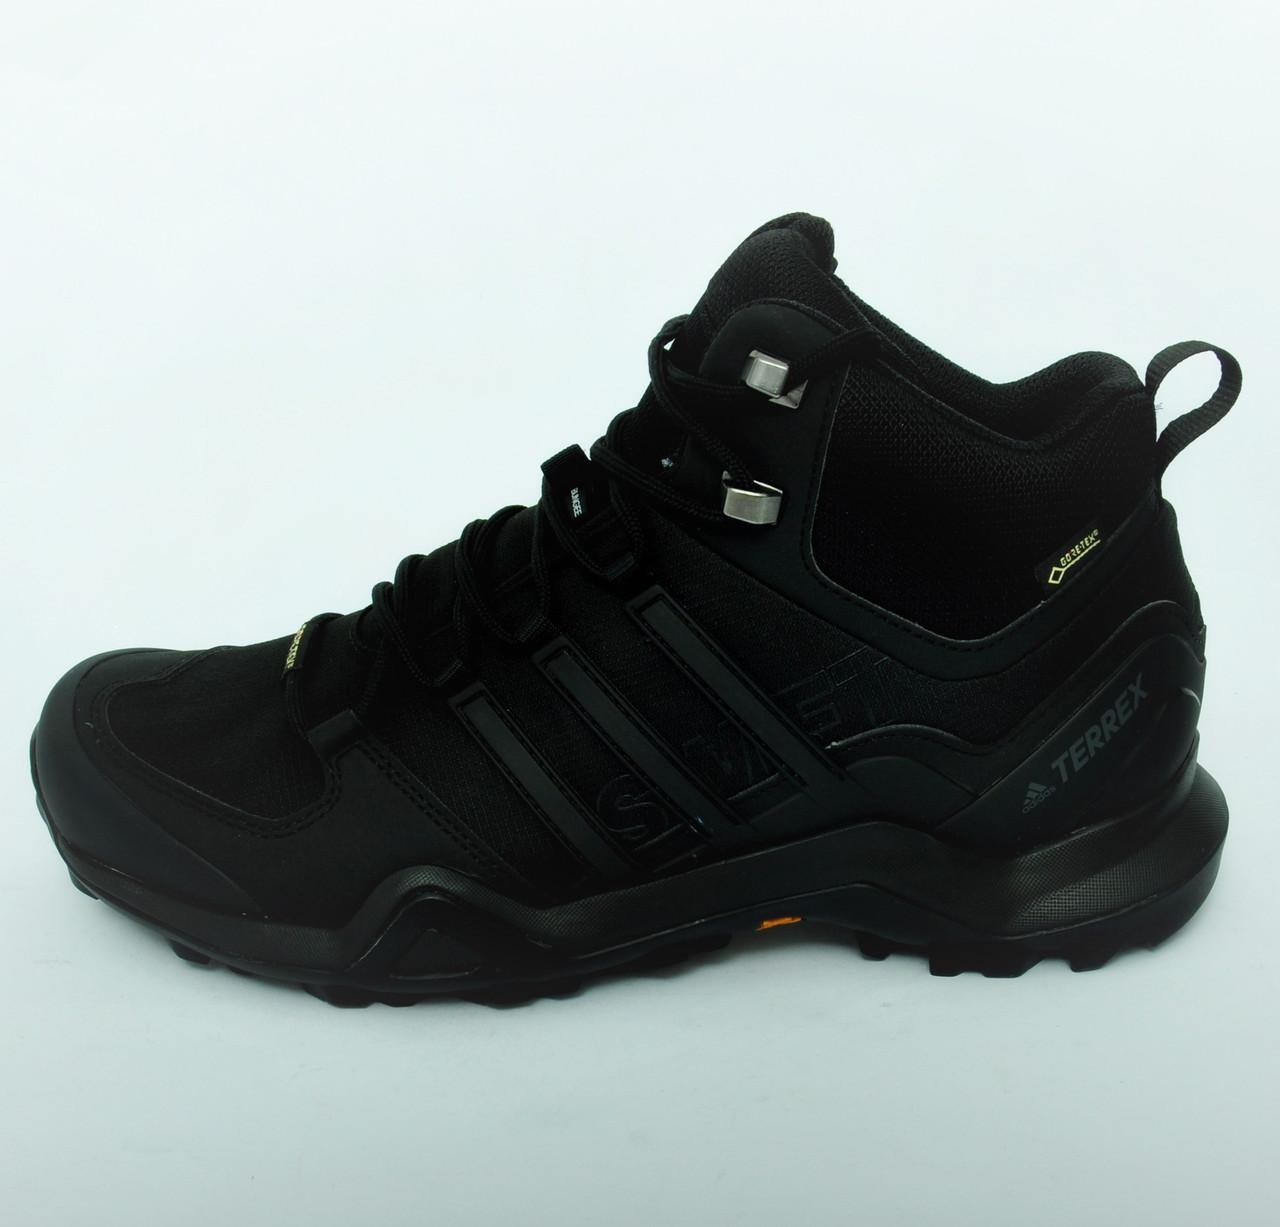 wholesale dealer 96e20 09bd1 Мужские ботинки Adidas Terrex Swift R2 Mid GTX Shoes CM7500 -  Интернет-магазин